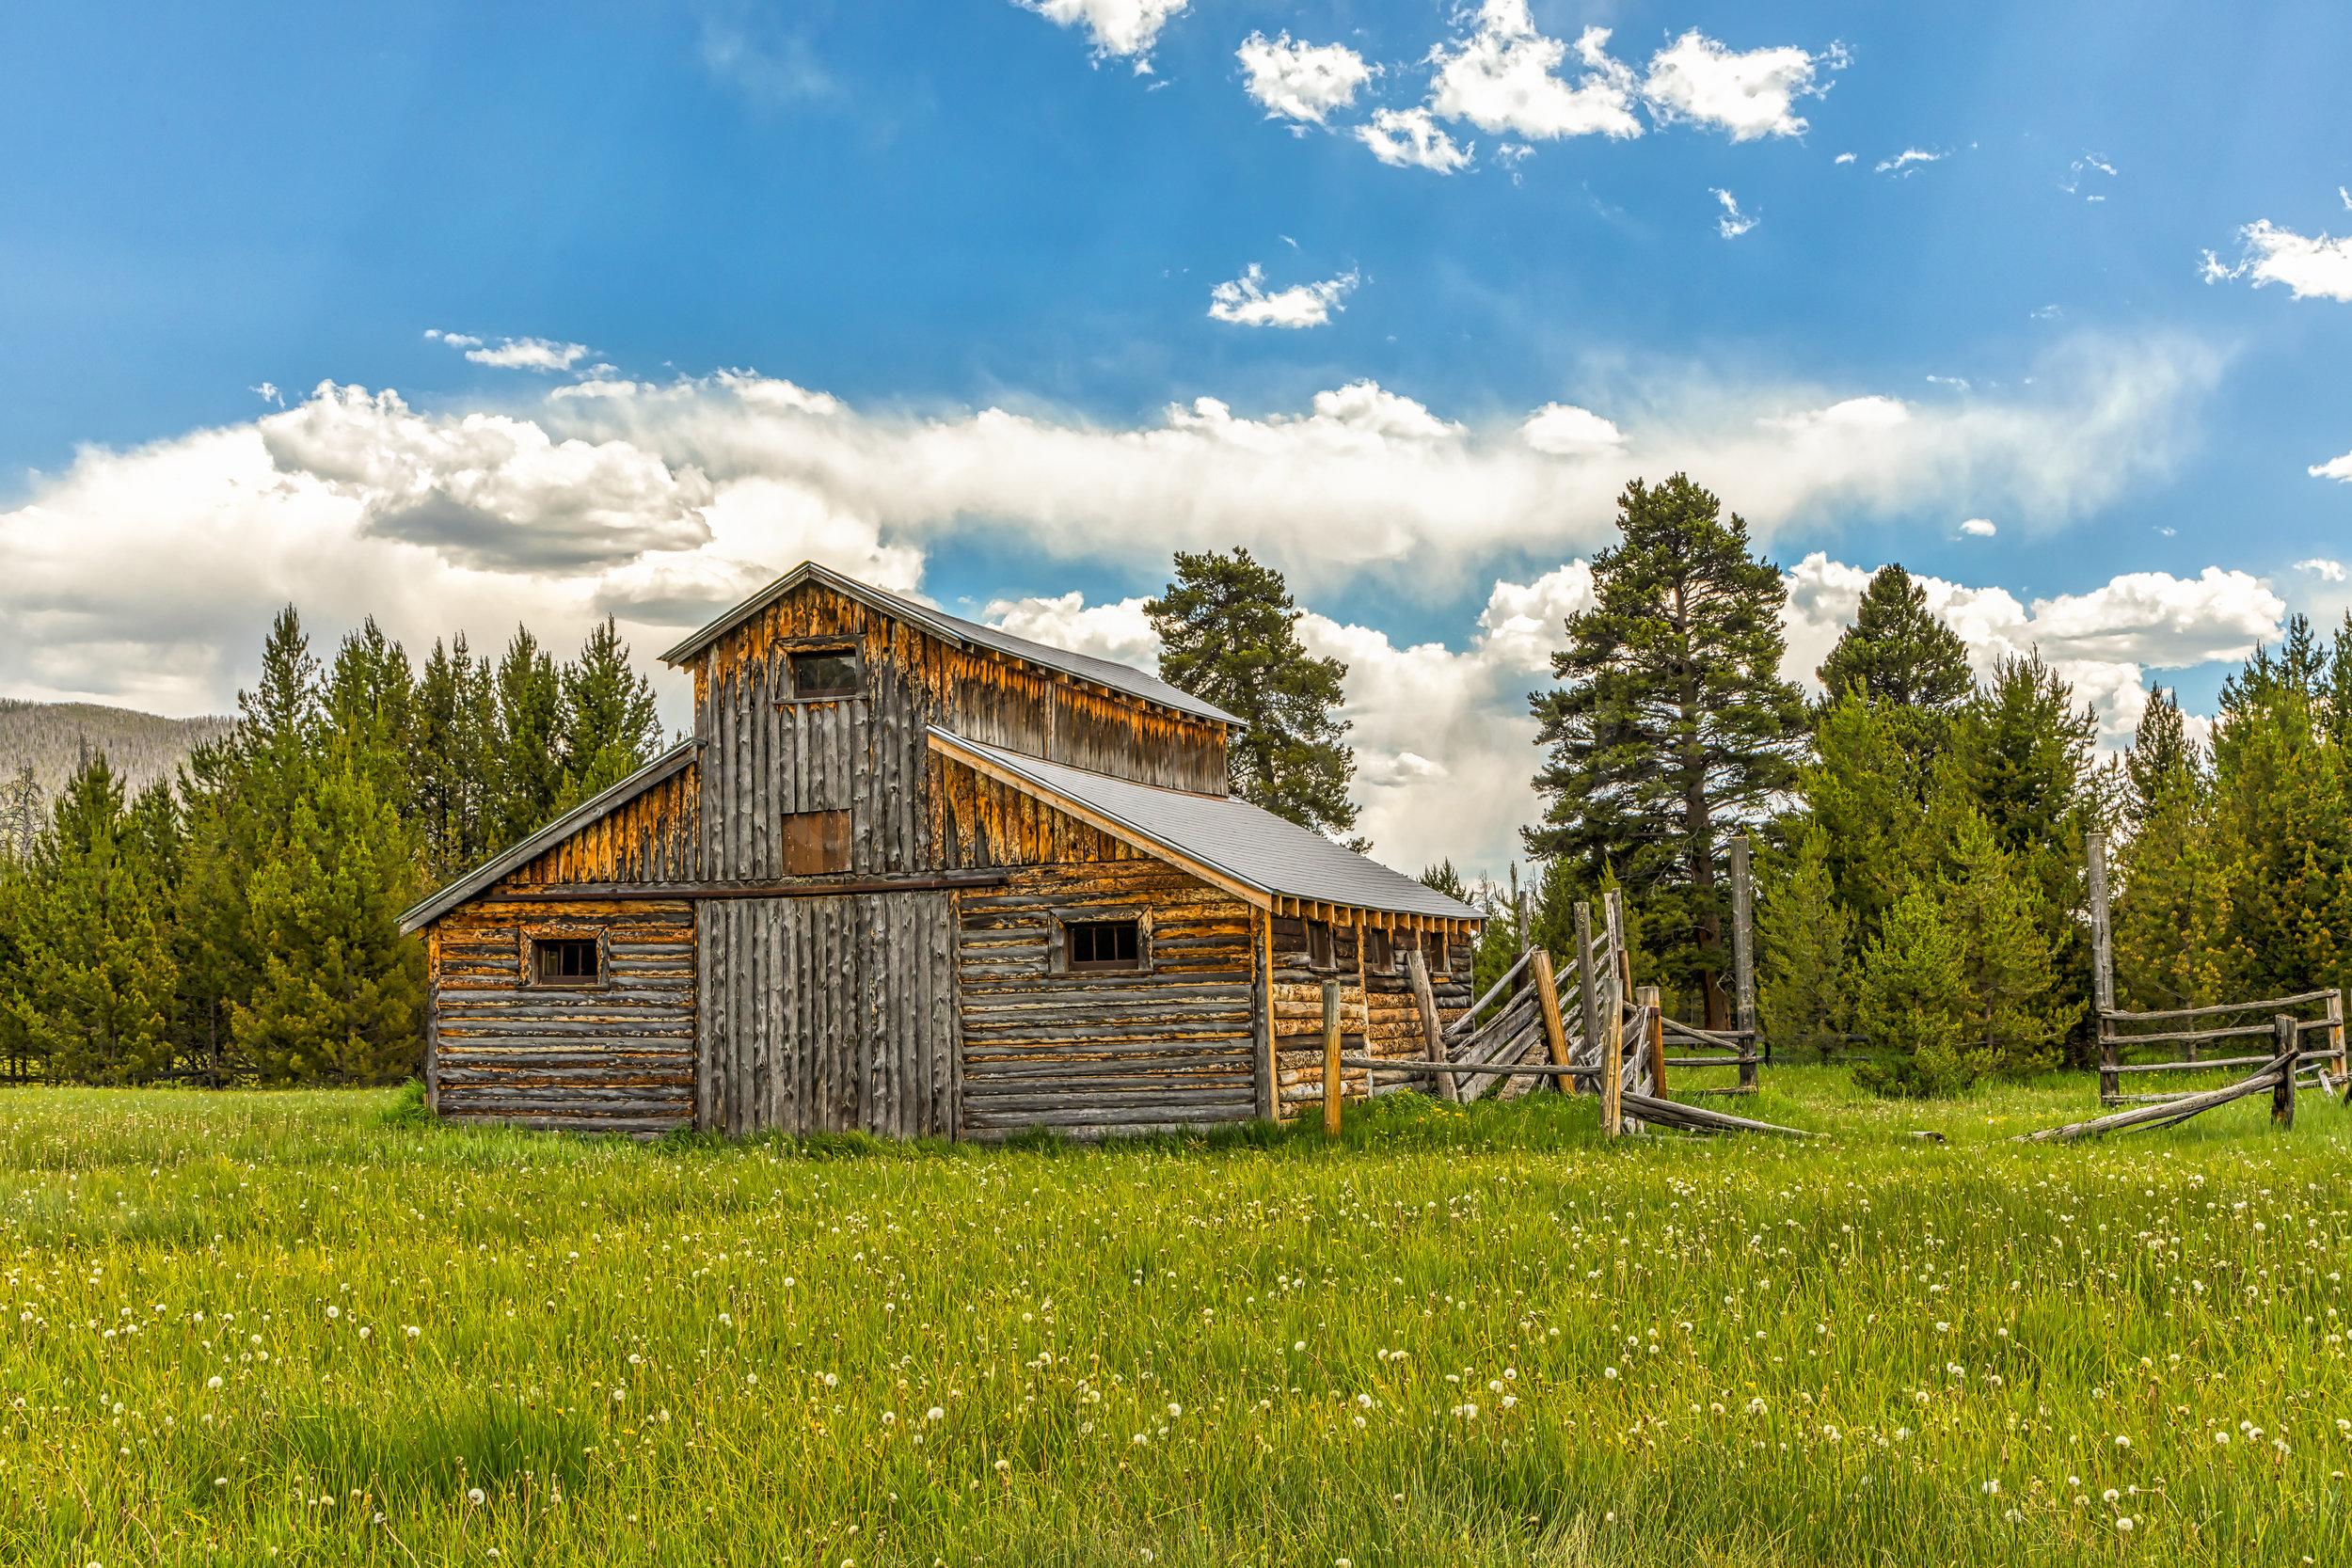 Little Buckaroo Barn, Image # 0596